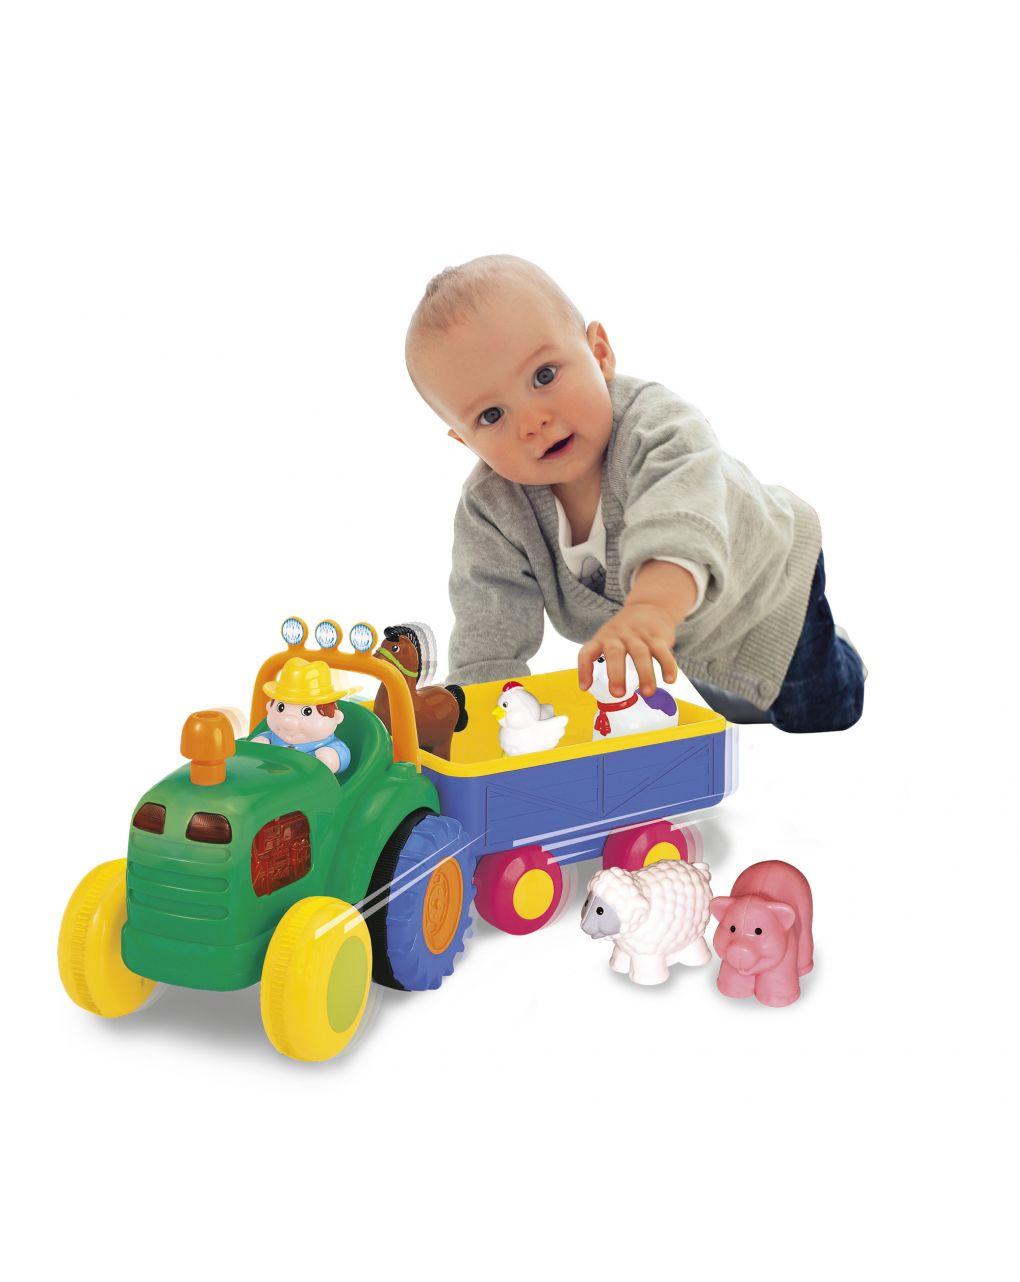 Baby smile - trattore con animali - Baby Smile